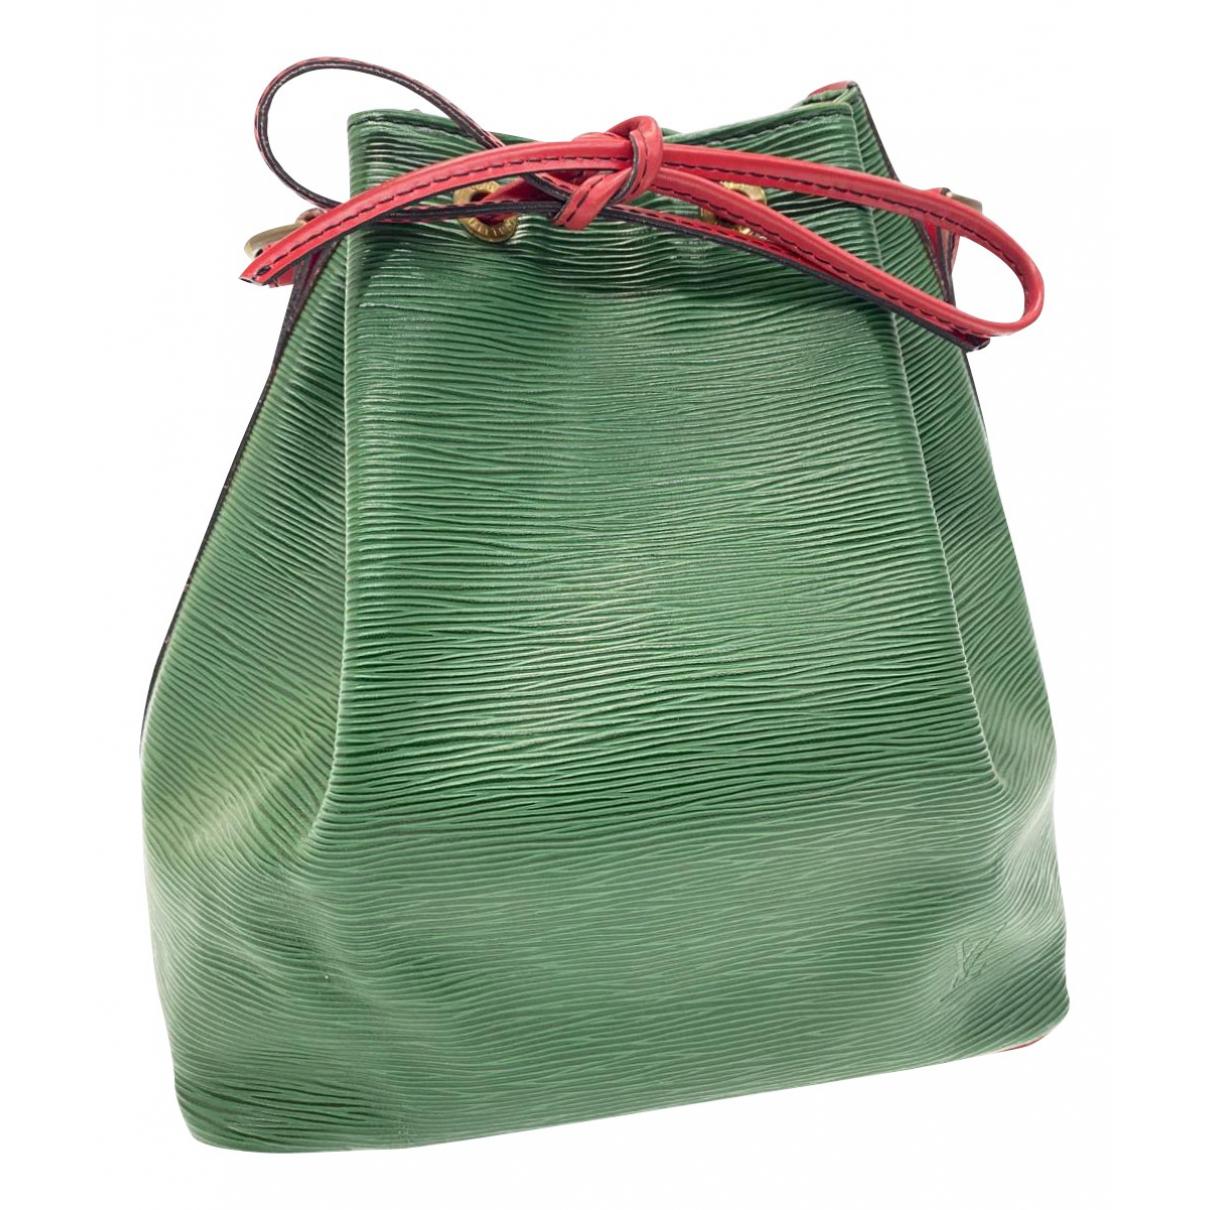 Bolso  Noe de Charol Louis Vuitton